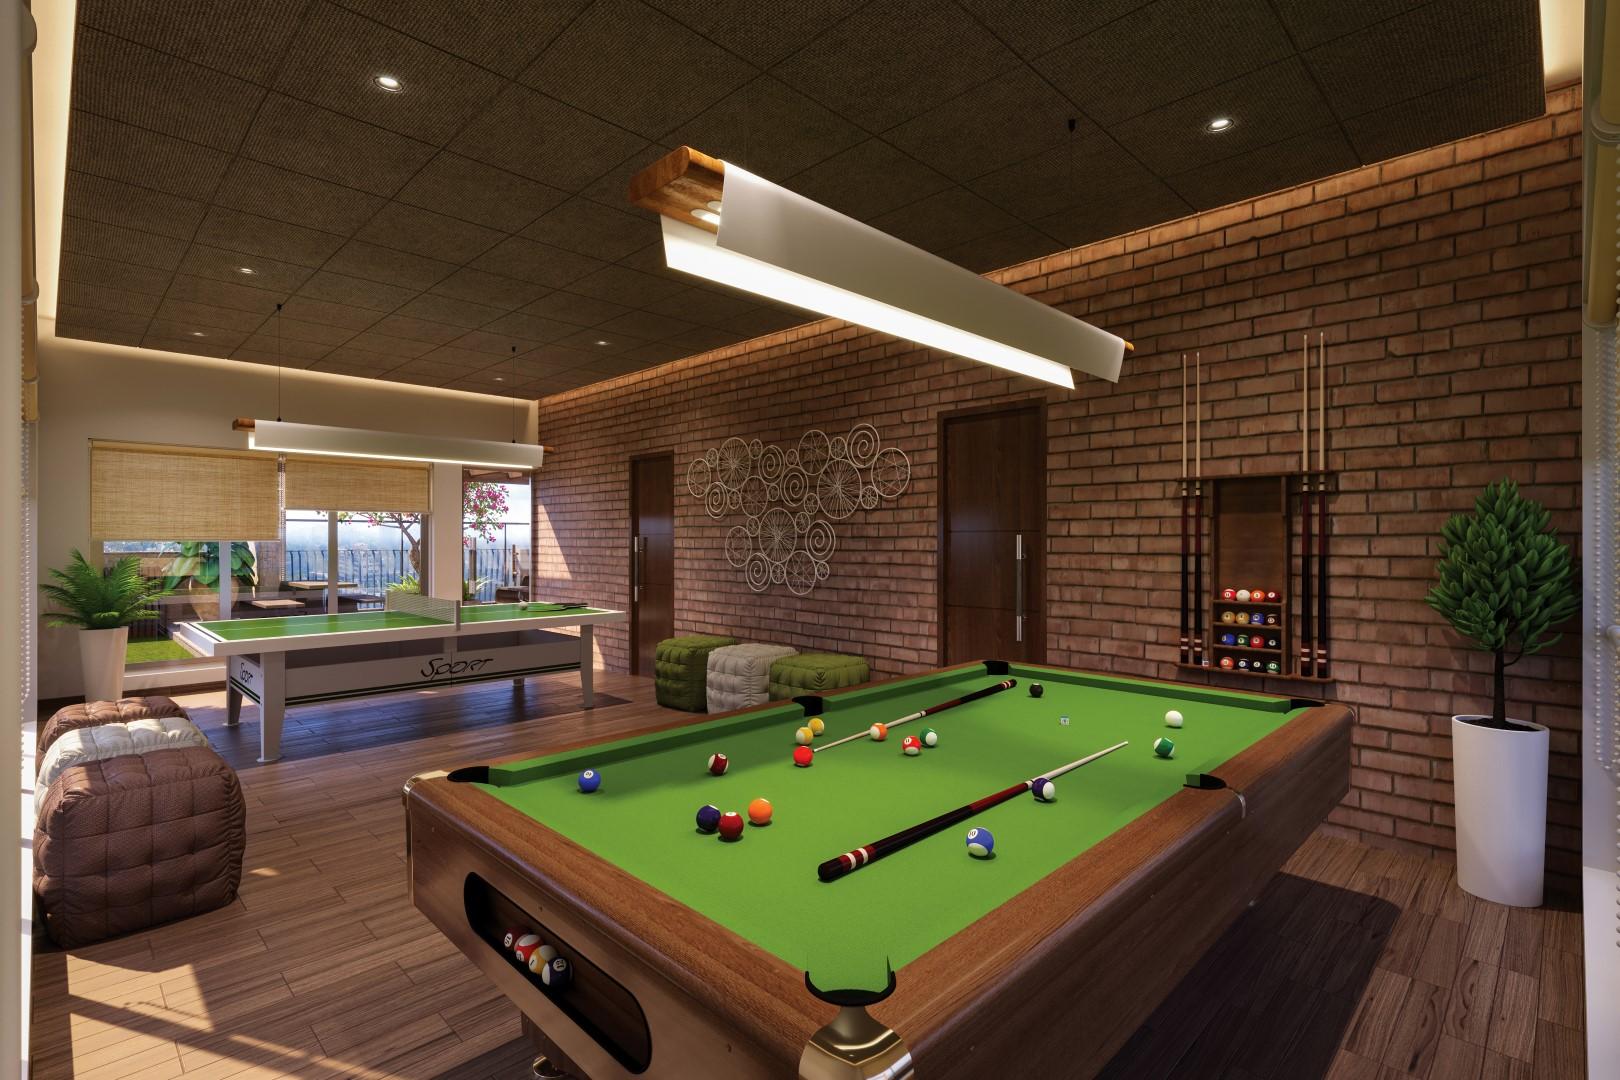 Game Room Interiors